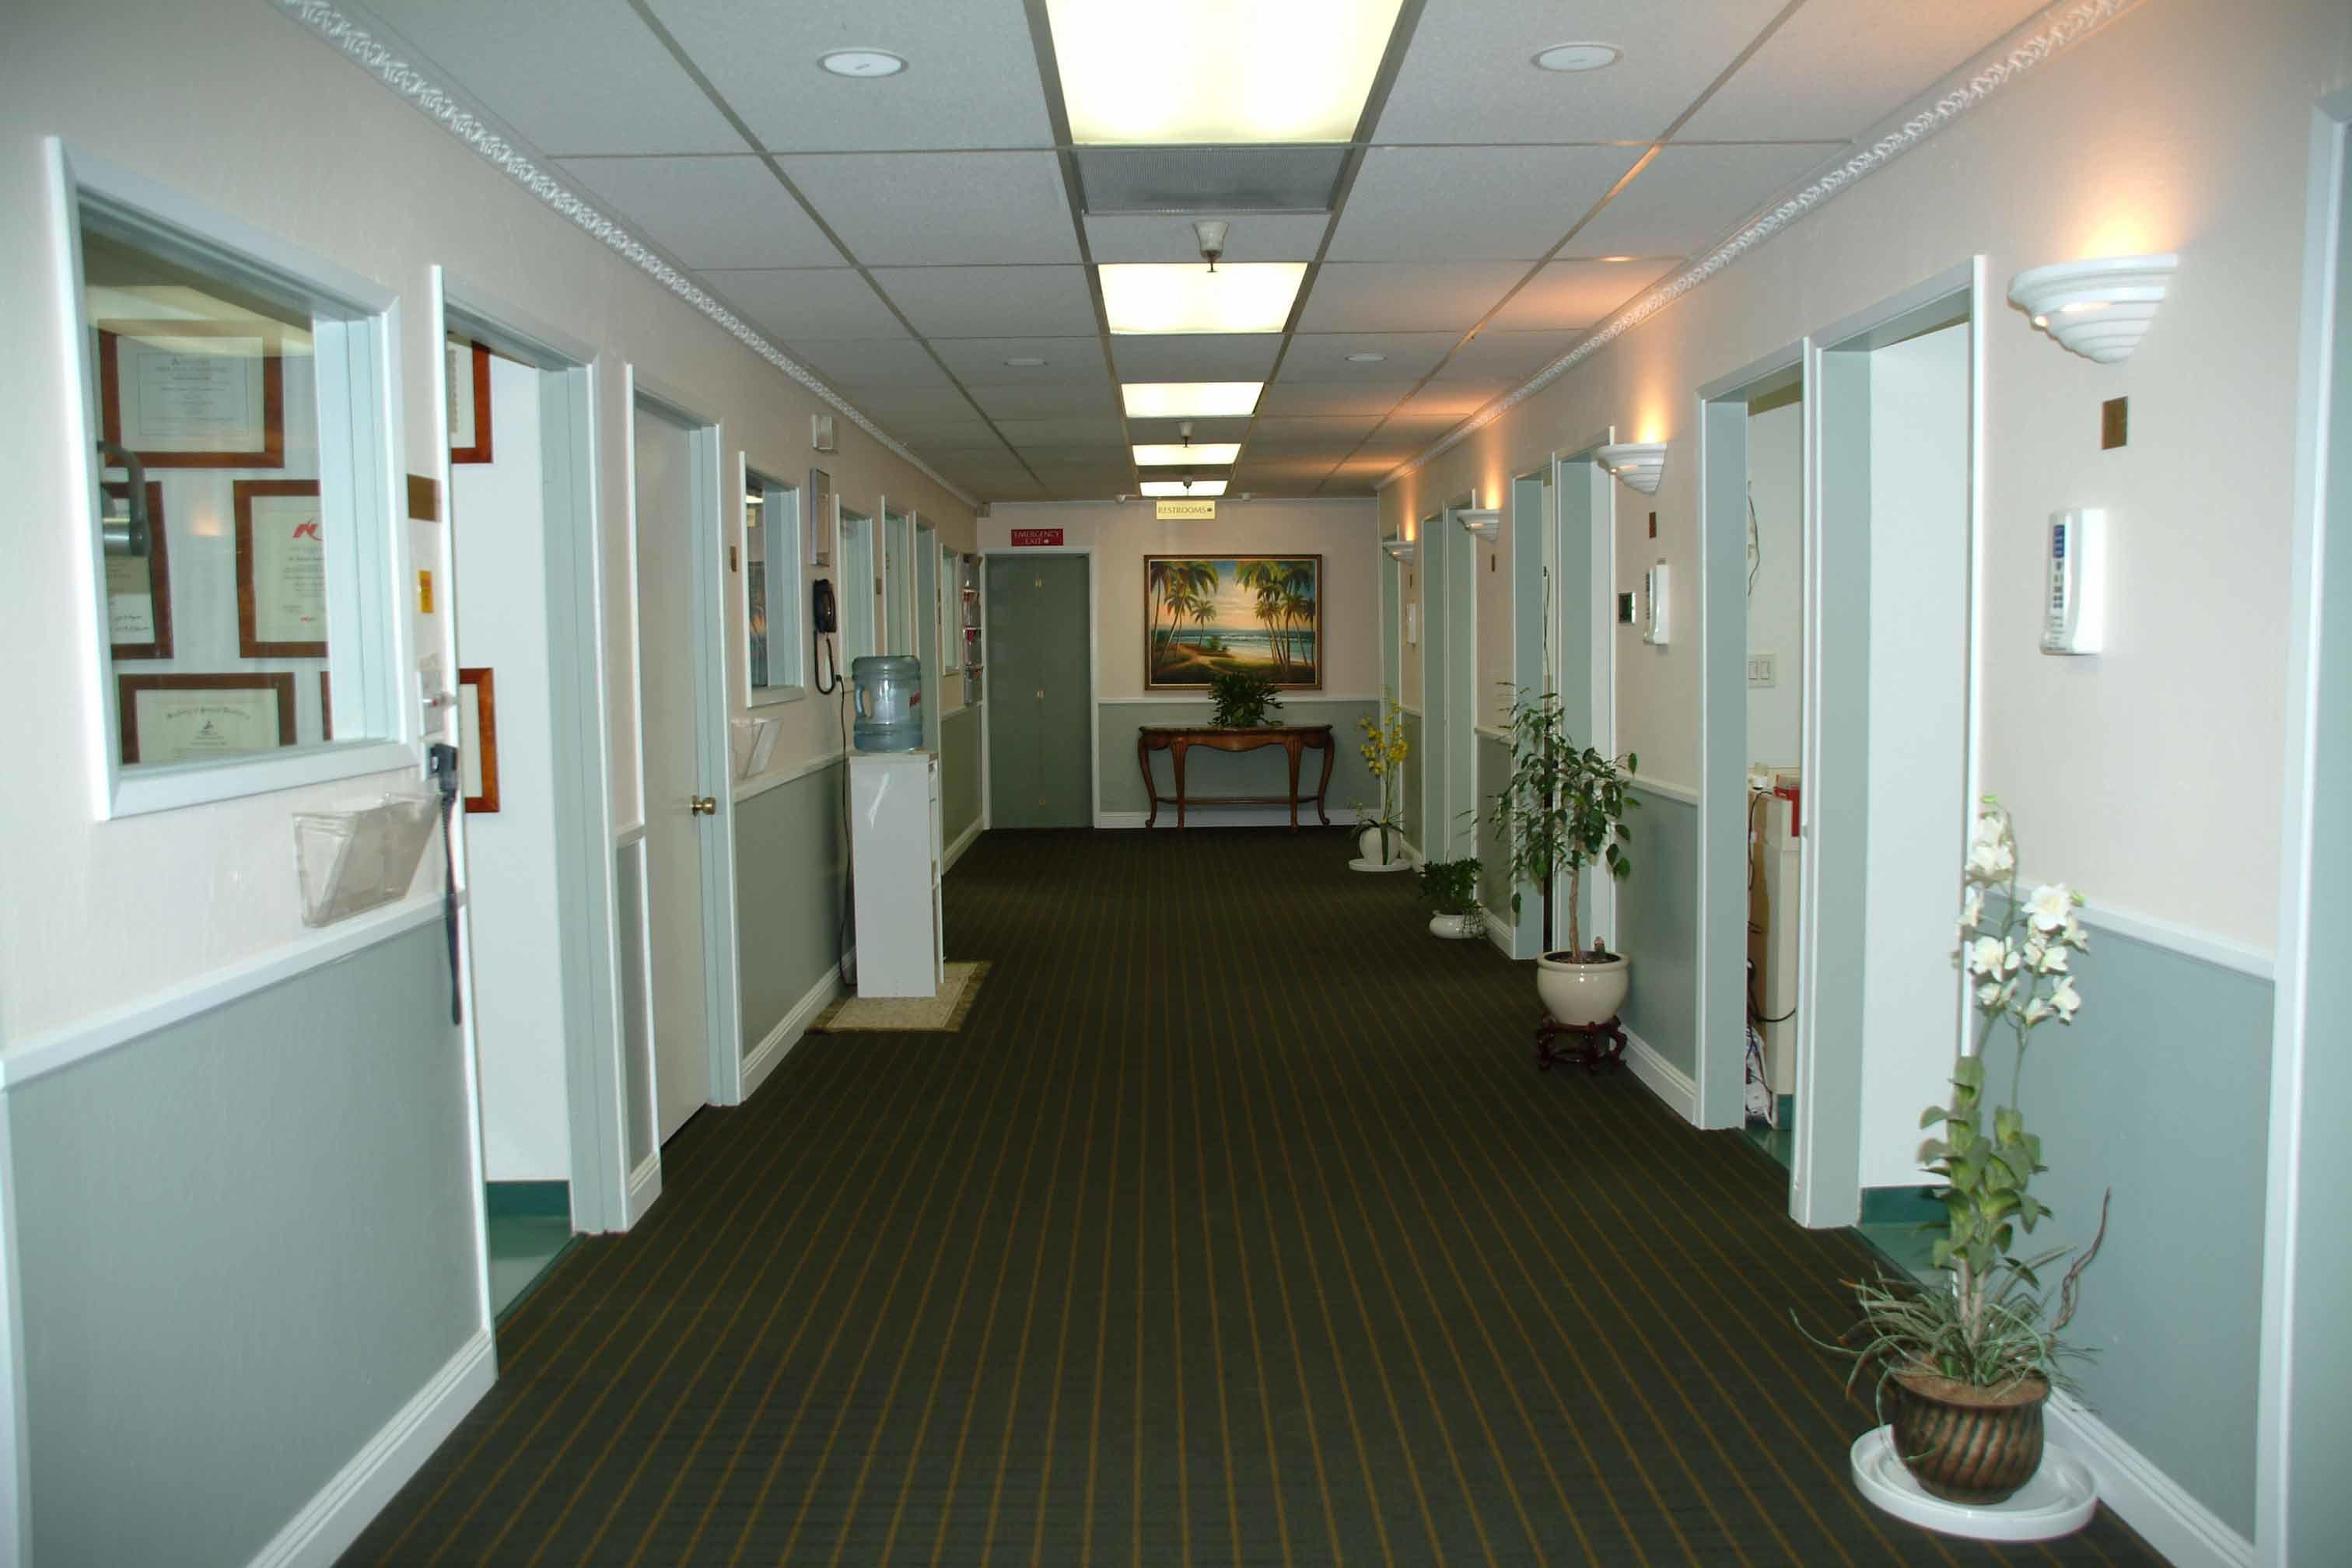 Sunnyvale Dental Care image 4